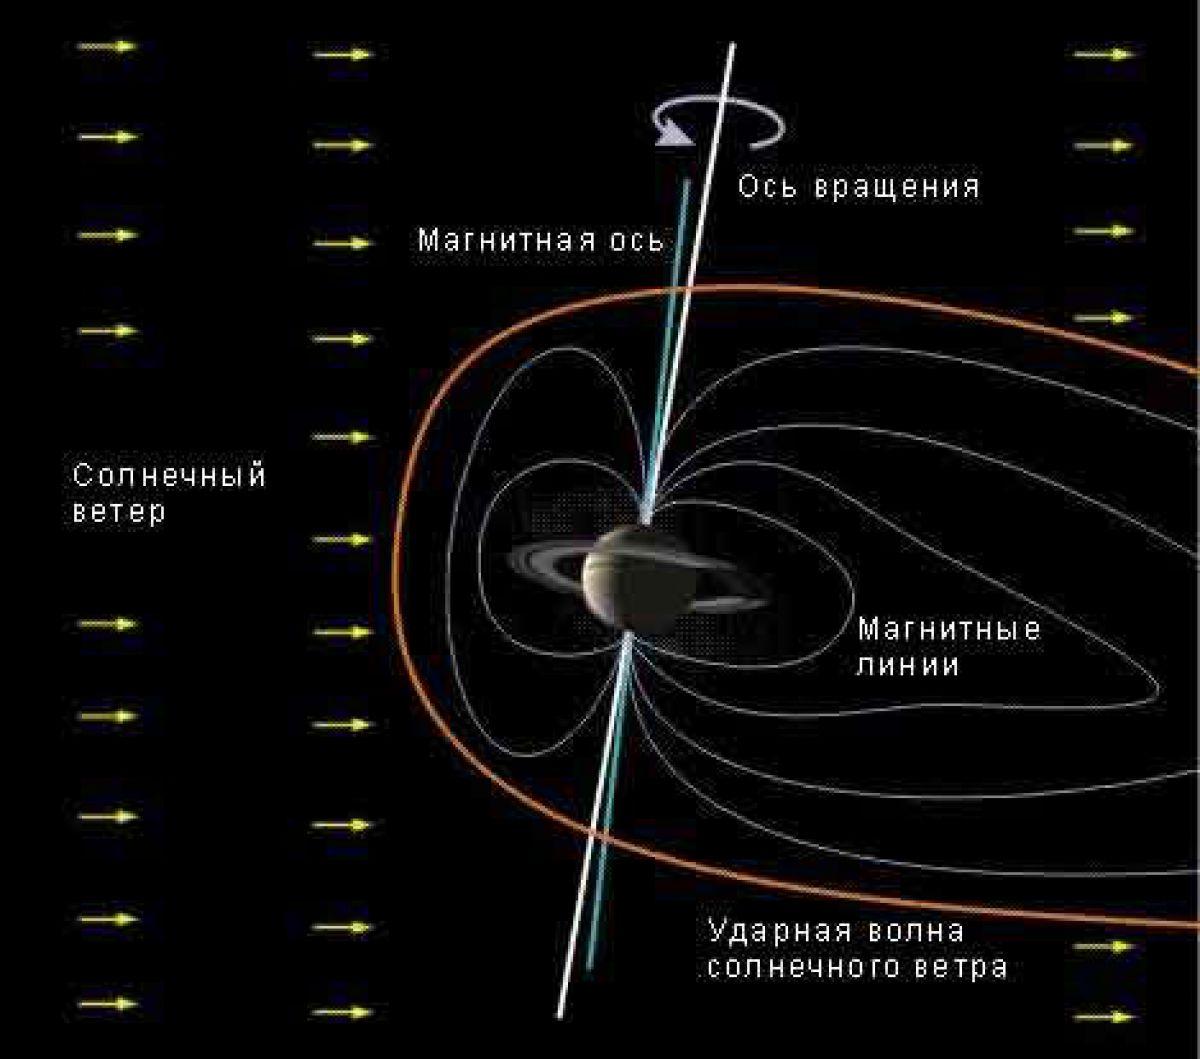 Планета Сатурн - второй Юпитер?